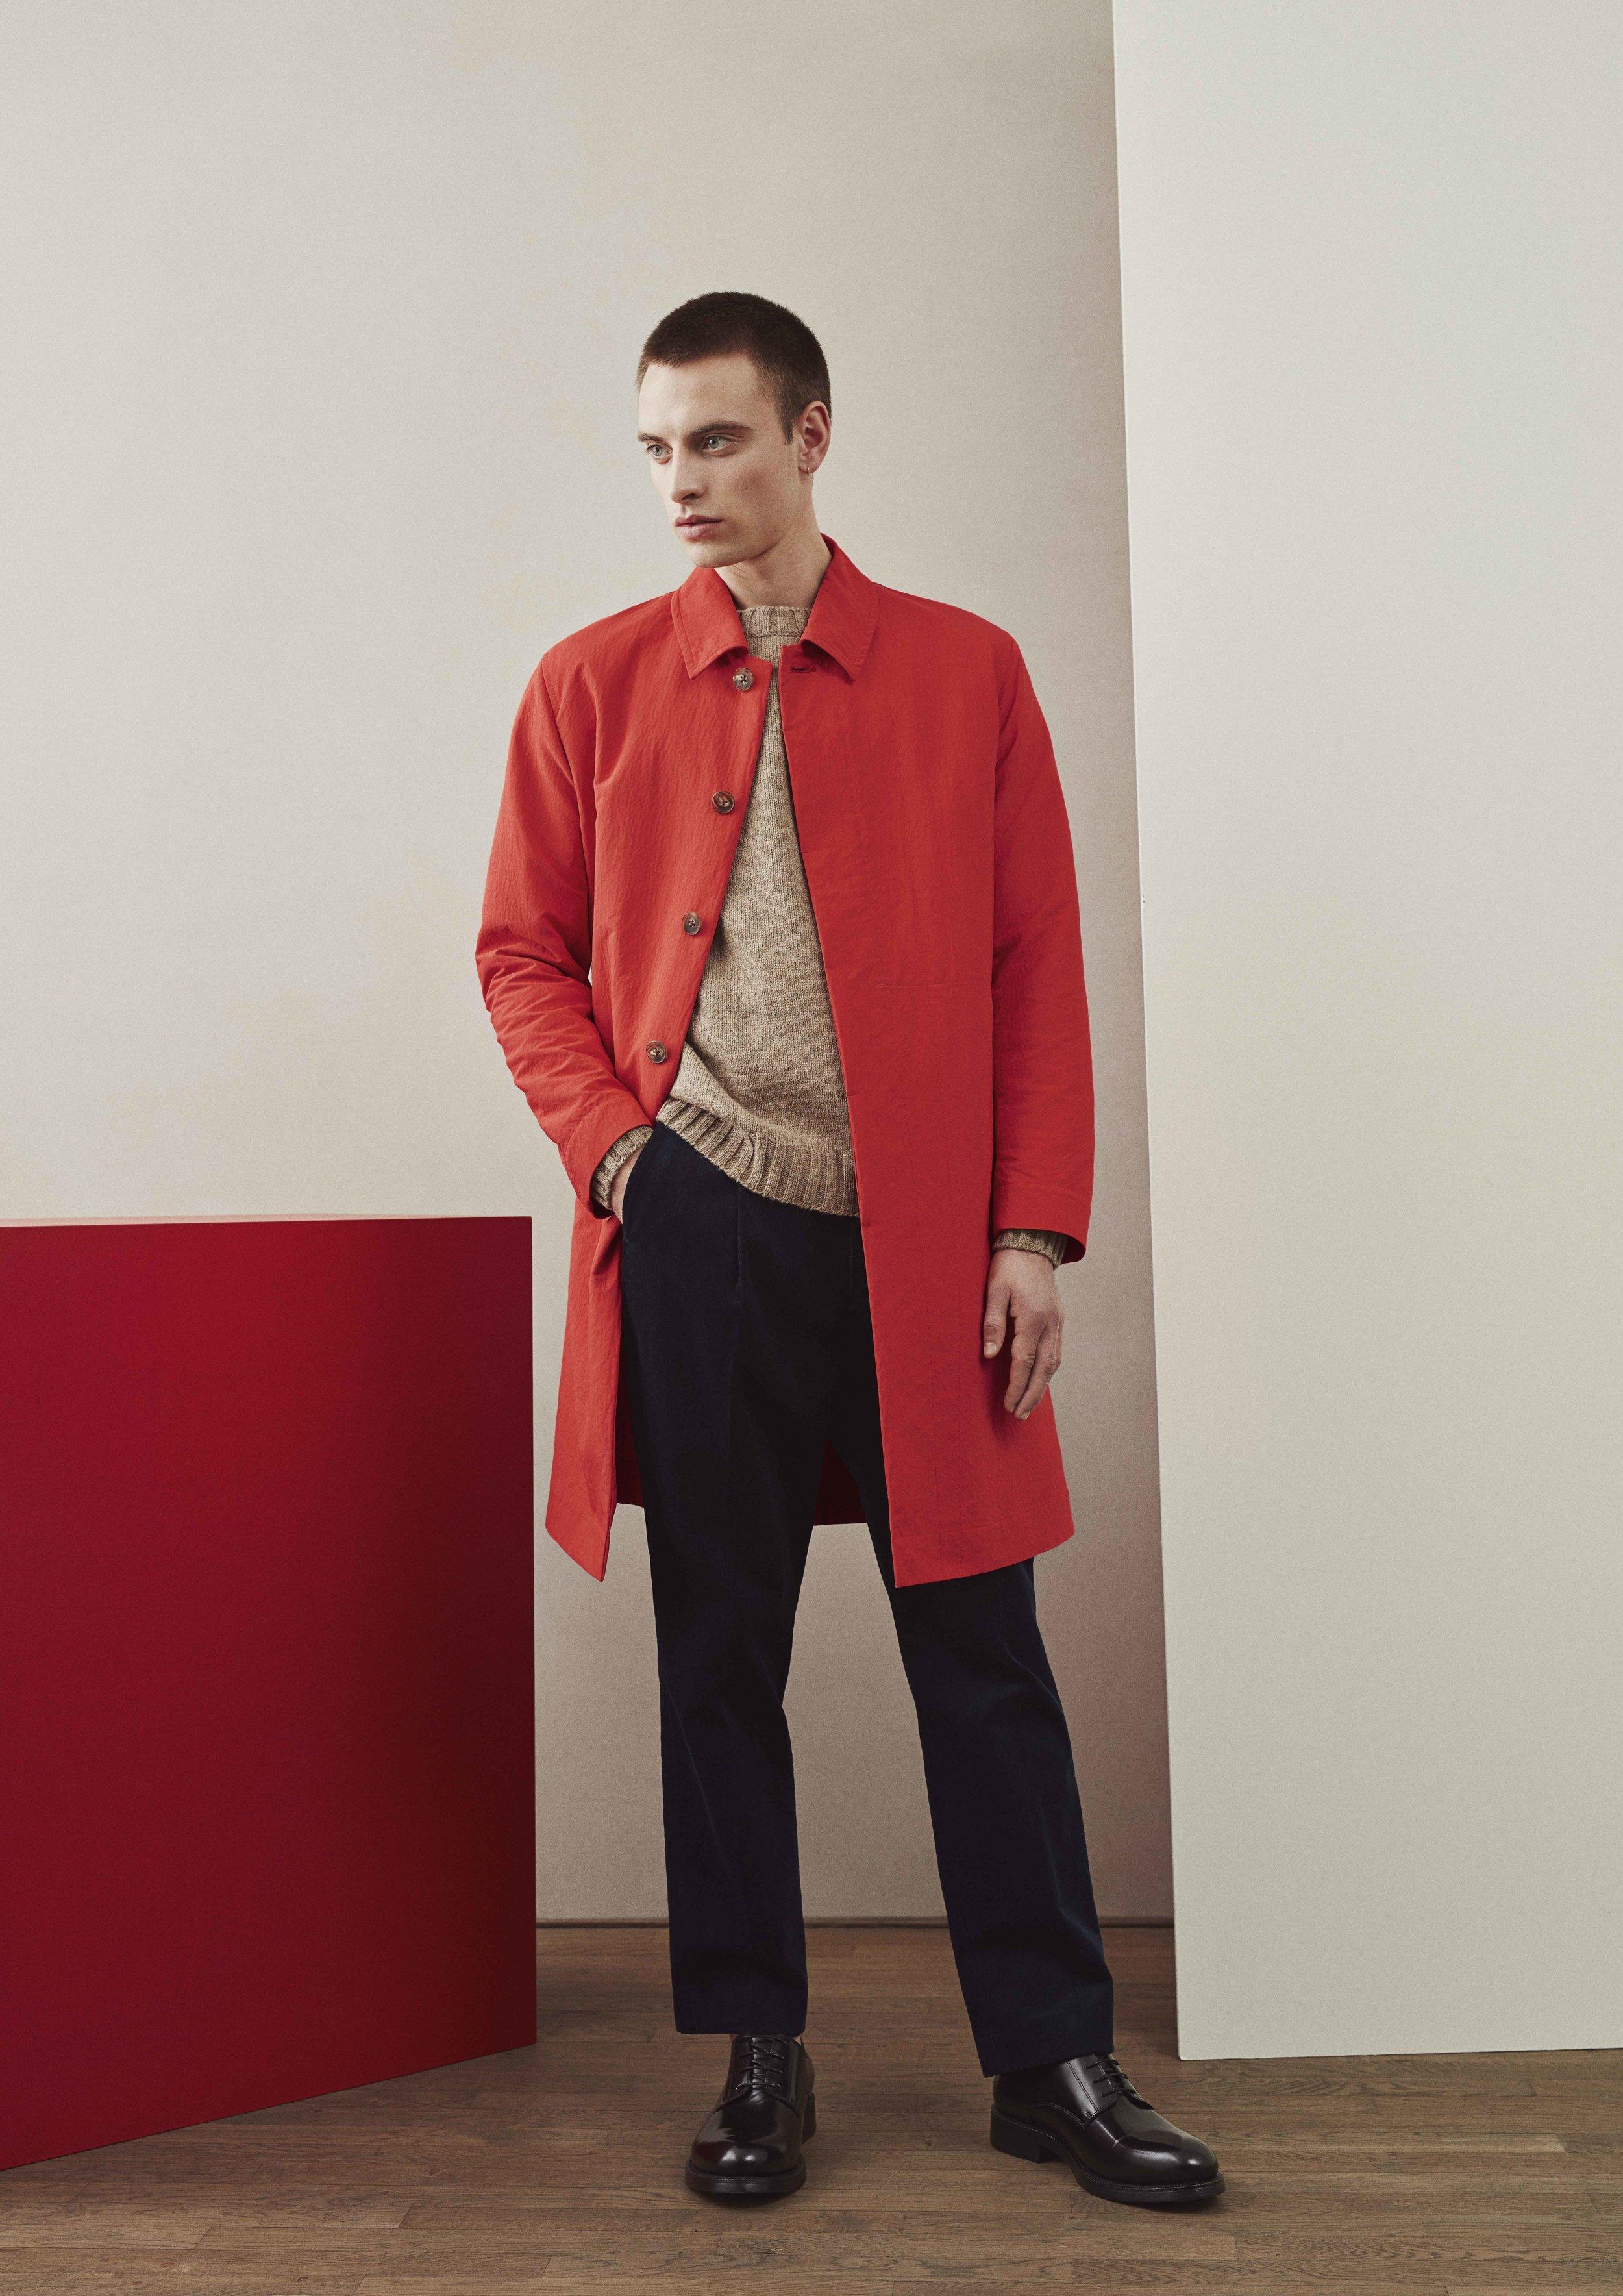 <b>4</b><br>Lukas Nylon Coat<br>Nias Shetland Wool Sweater<br>Theo Corduroy Pants